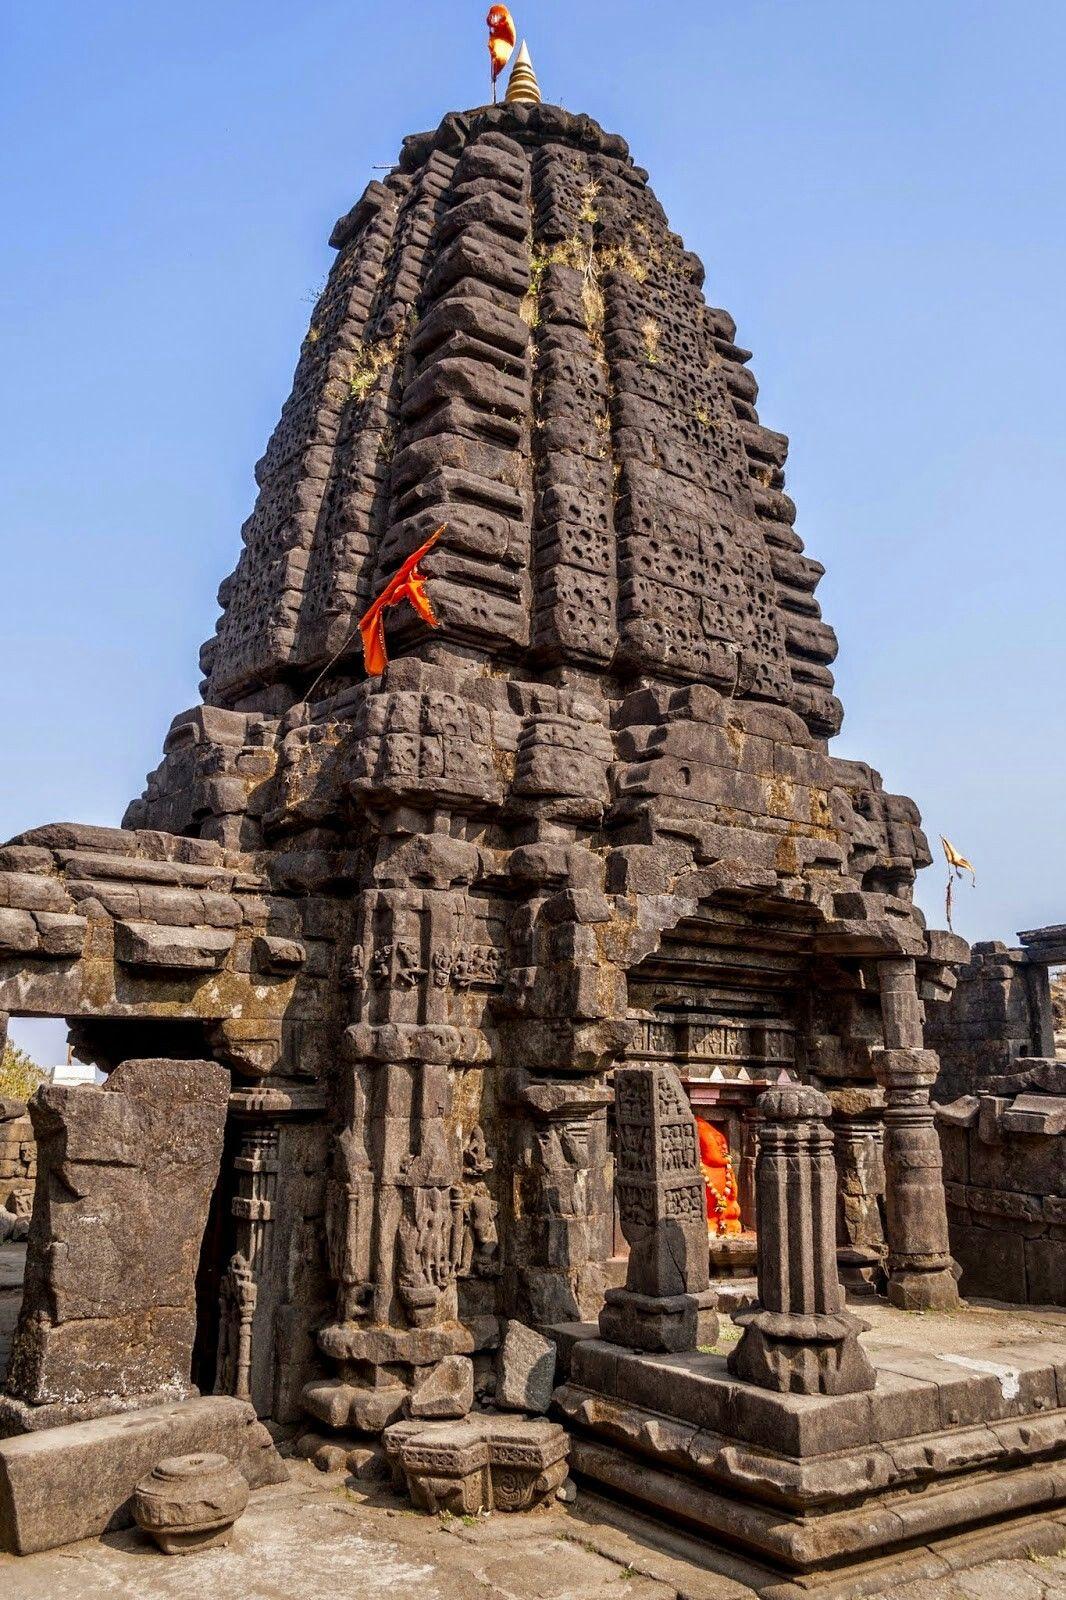 Harishchandragad Temple